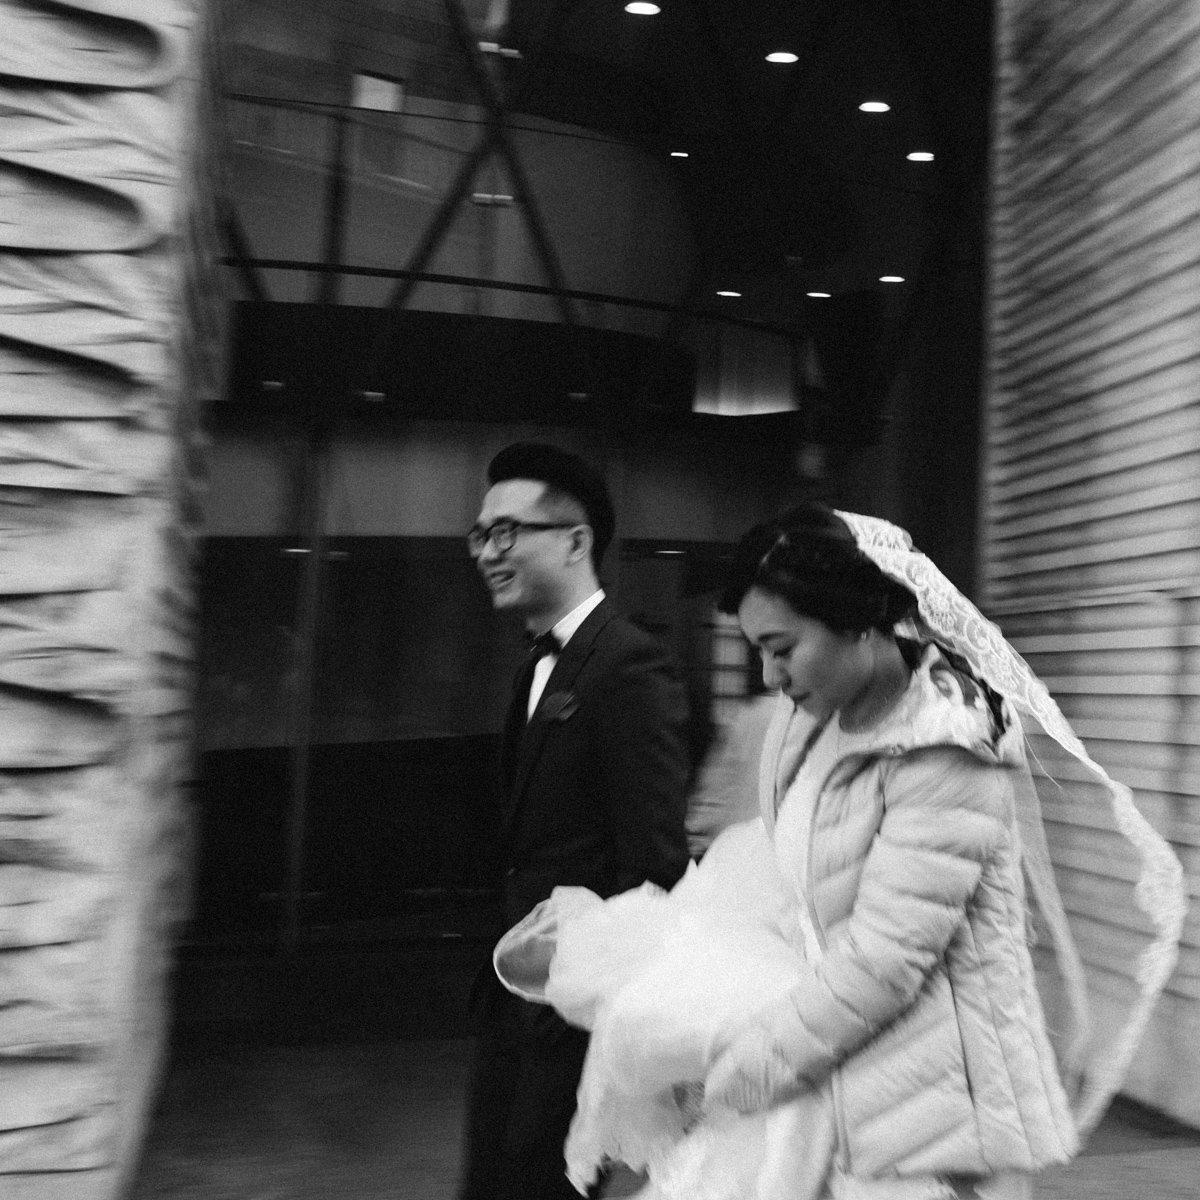 Milan wedding photographer. Street wedding